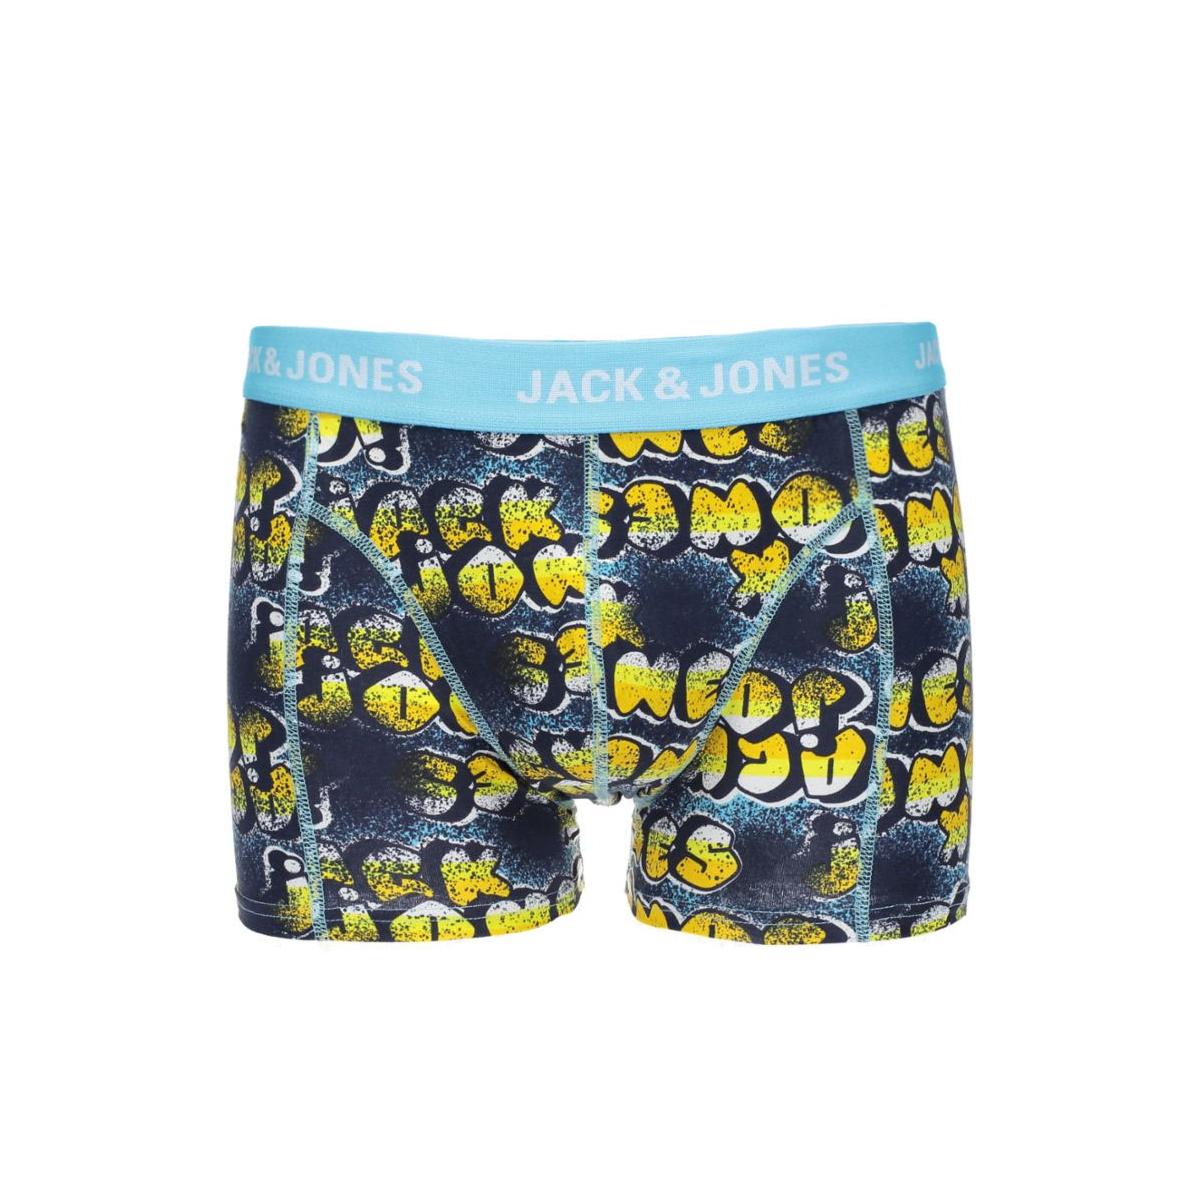 jjacymexitype trunks 12107233 jack & jones ondergoed blue fish